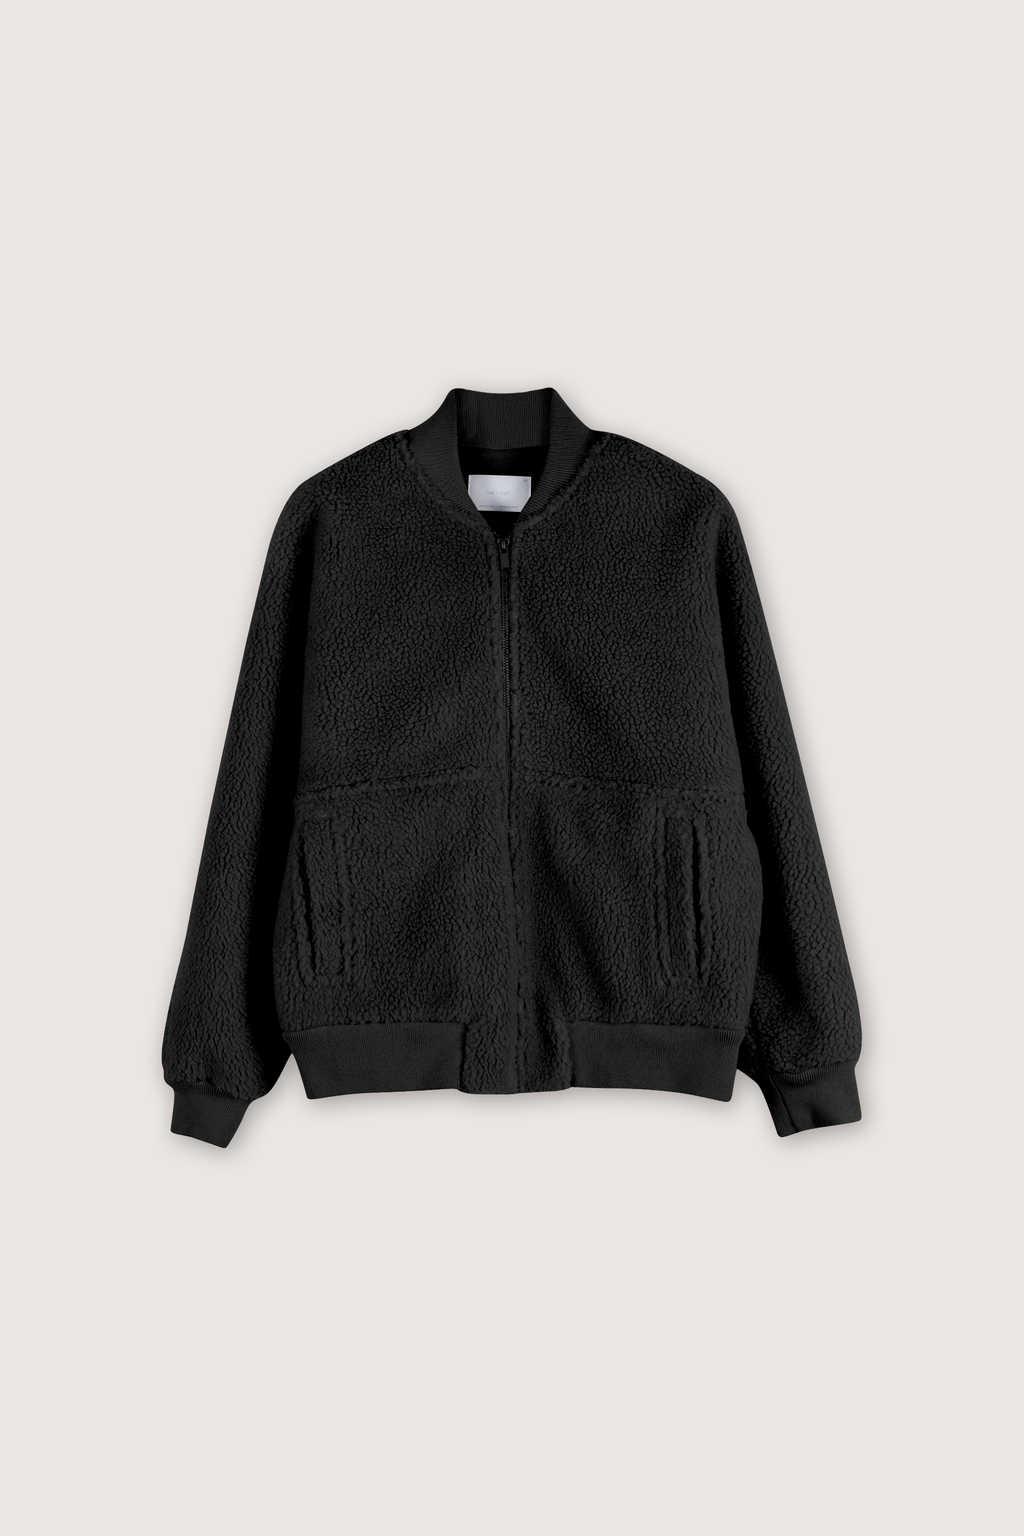 Jacket 1945 Black 11